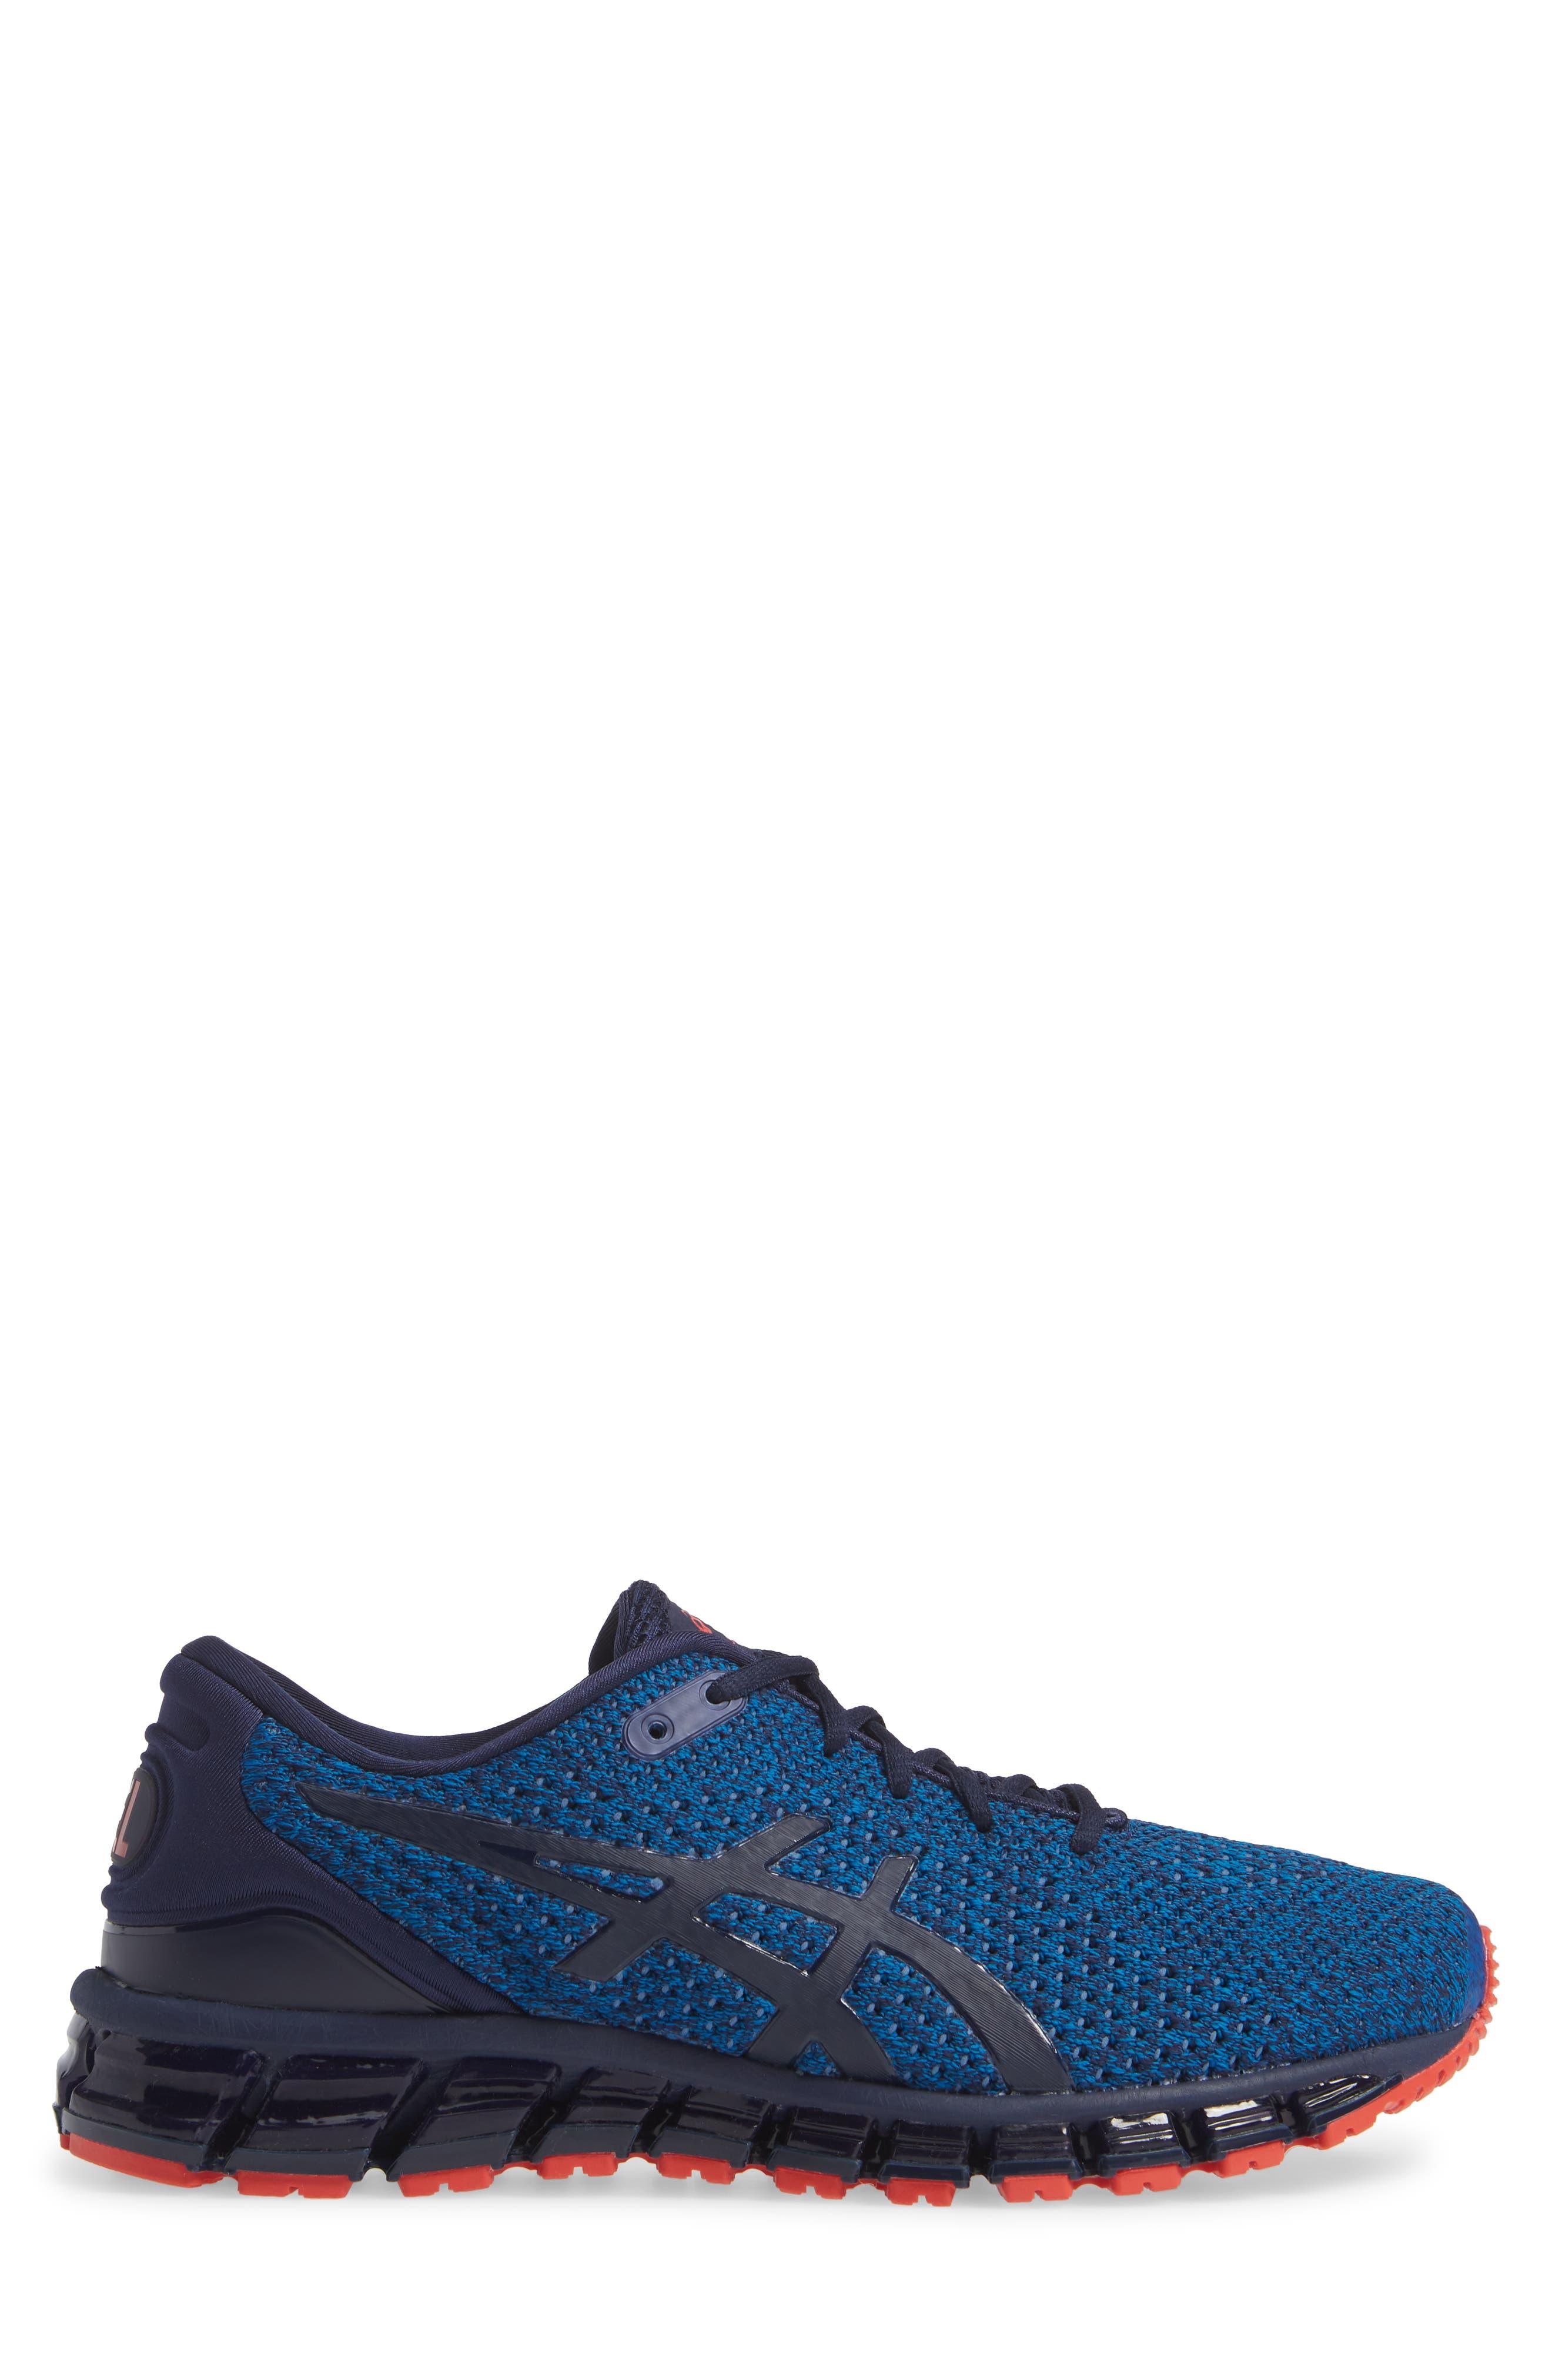 GEL-Quantum 360 Running Shoe,                             Alternate thumbnail 3, color,                             RACE BLUE